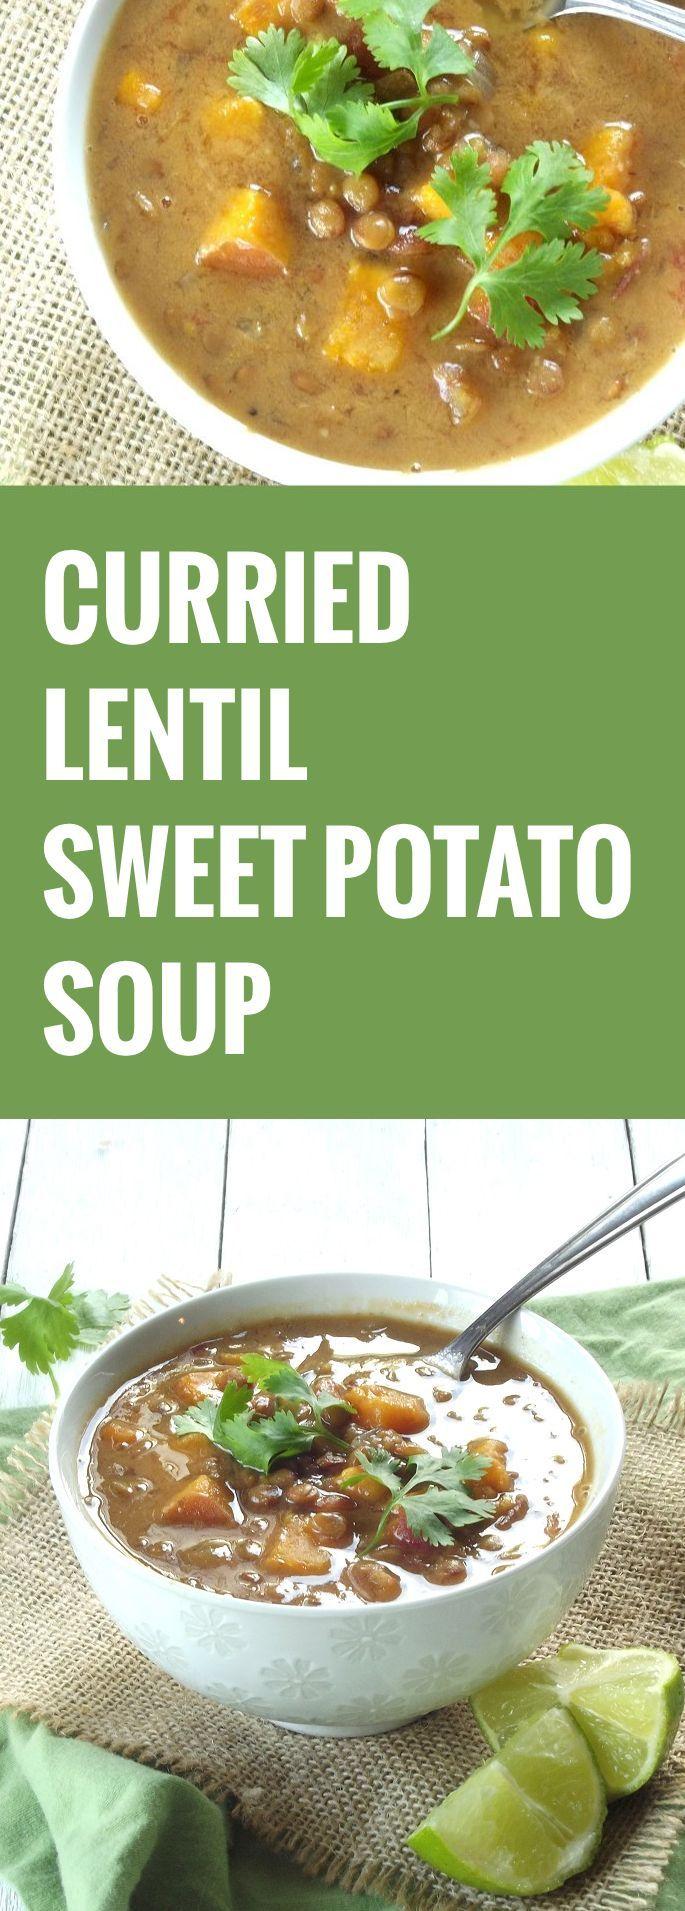 Slow Cooker Curried Lentil Sweet Potato Soup